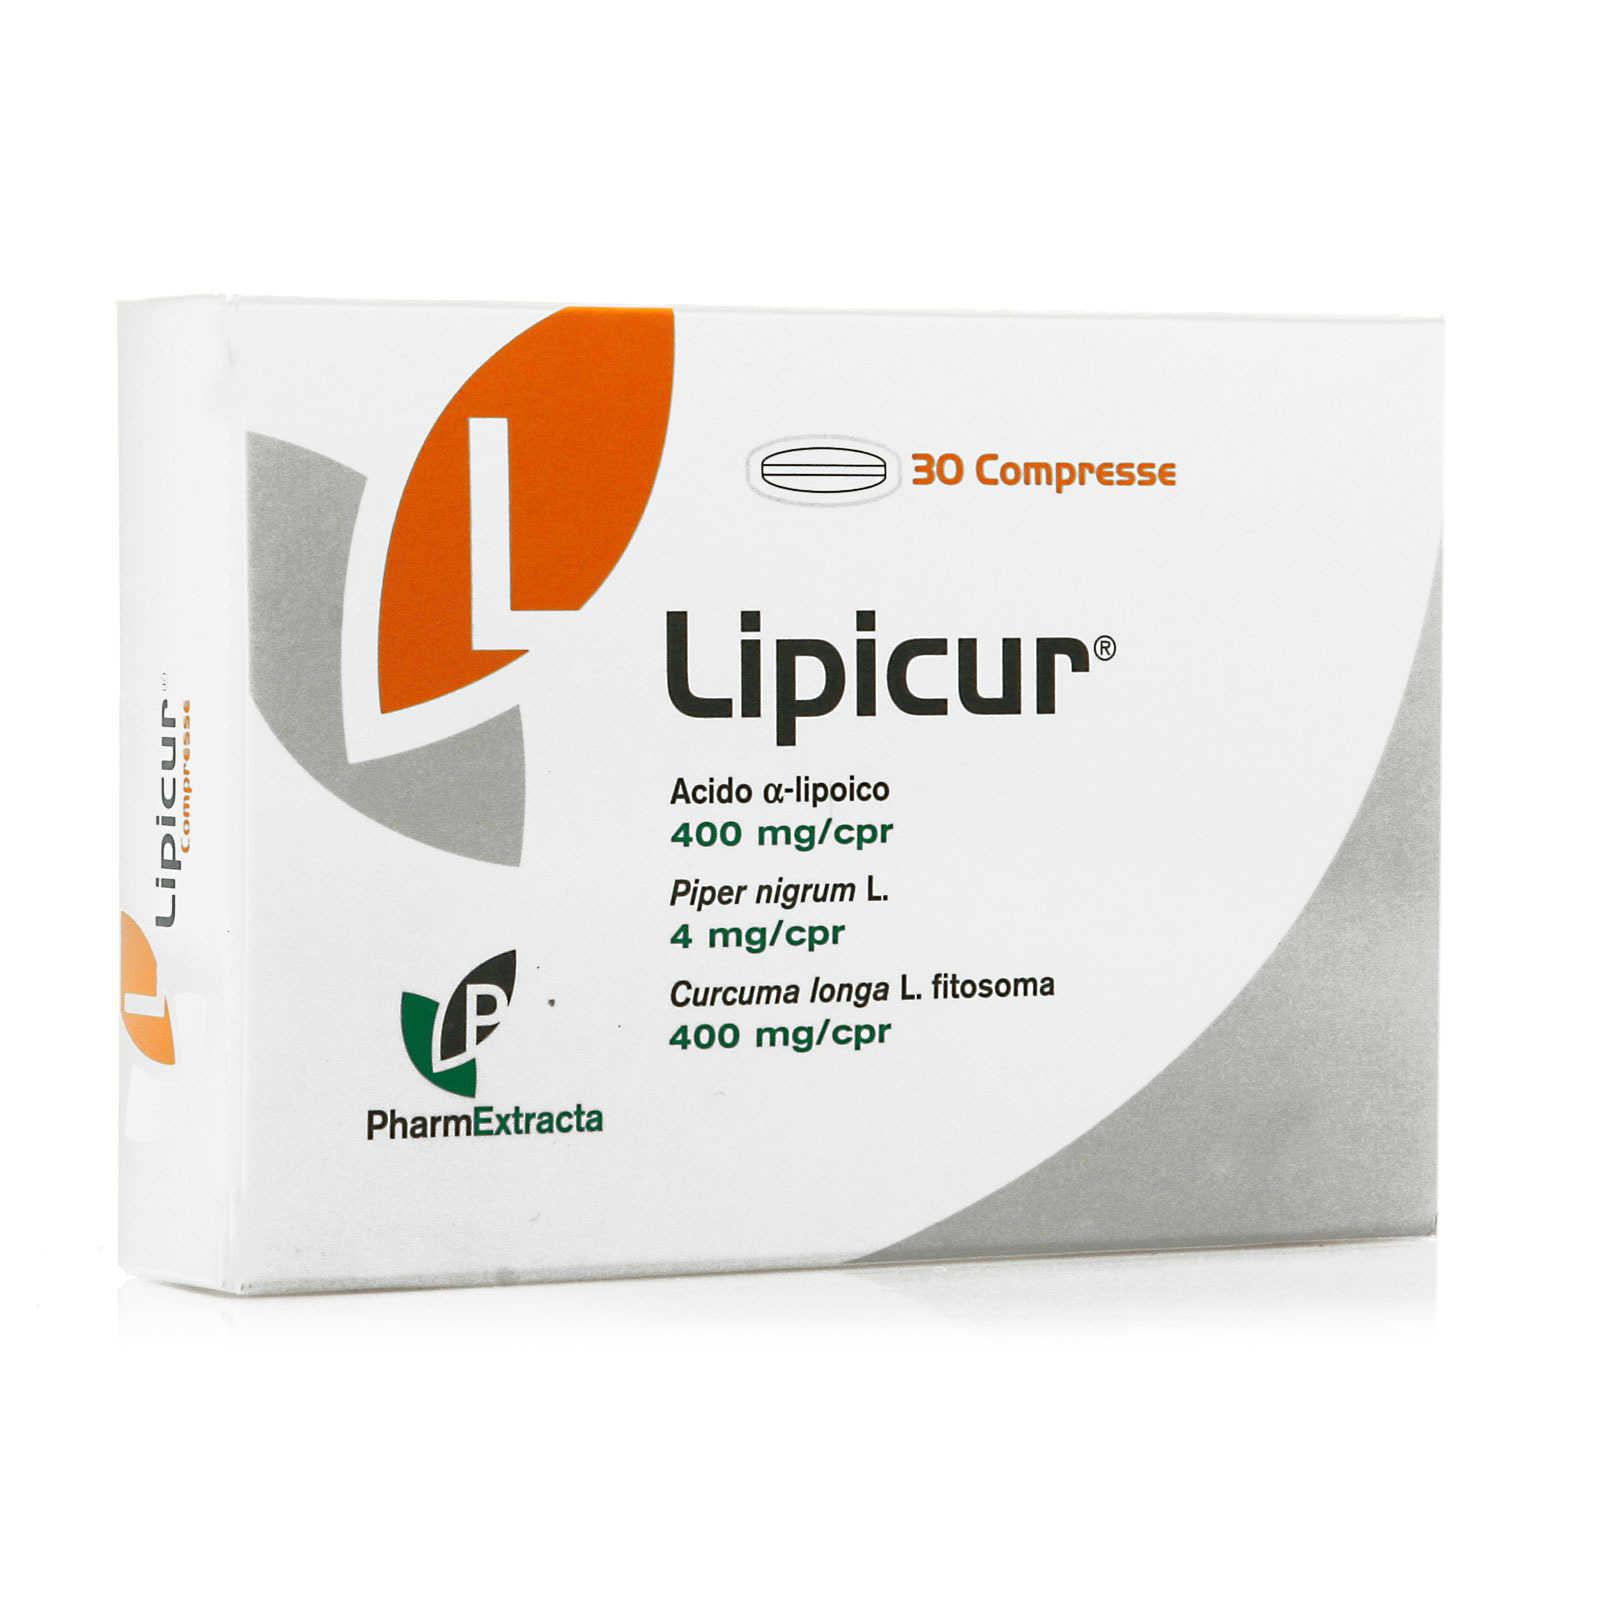 Lipicur - Integratore alimentare antiossidante